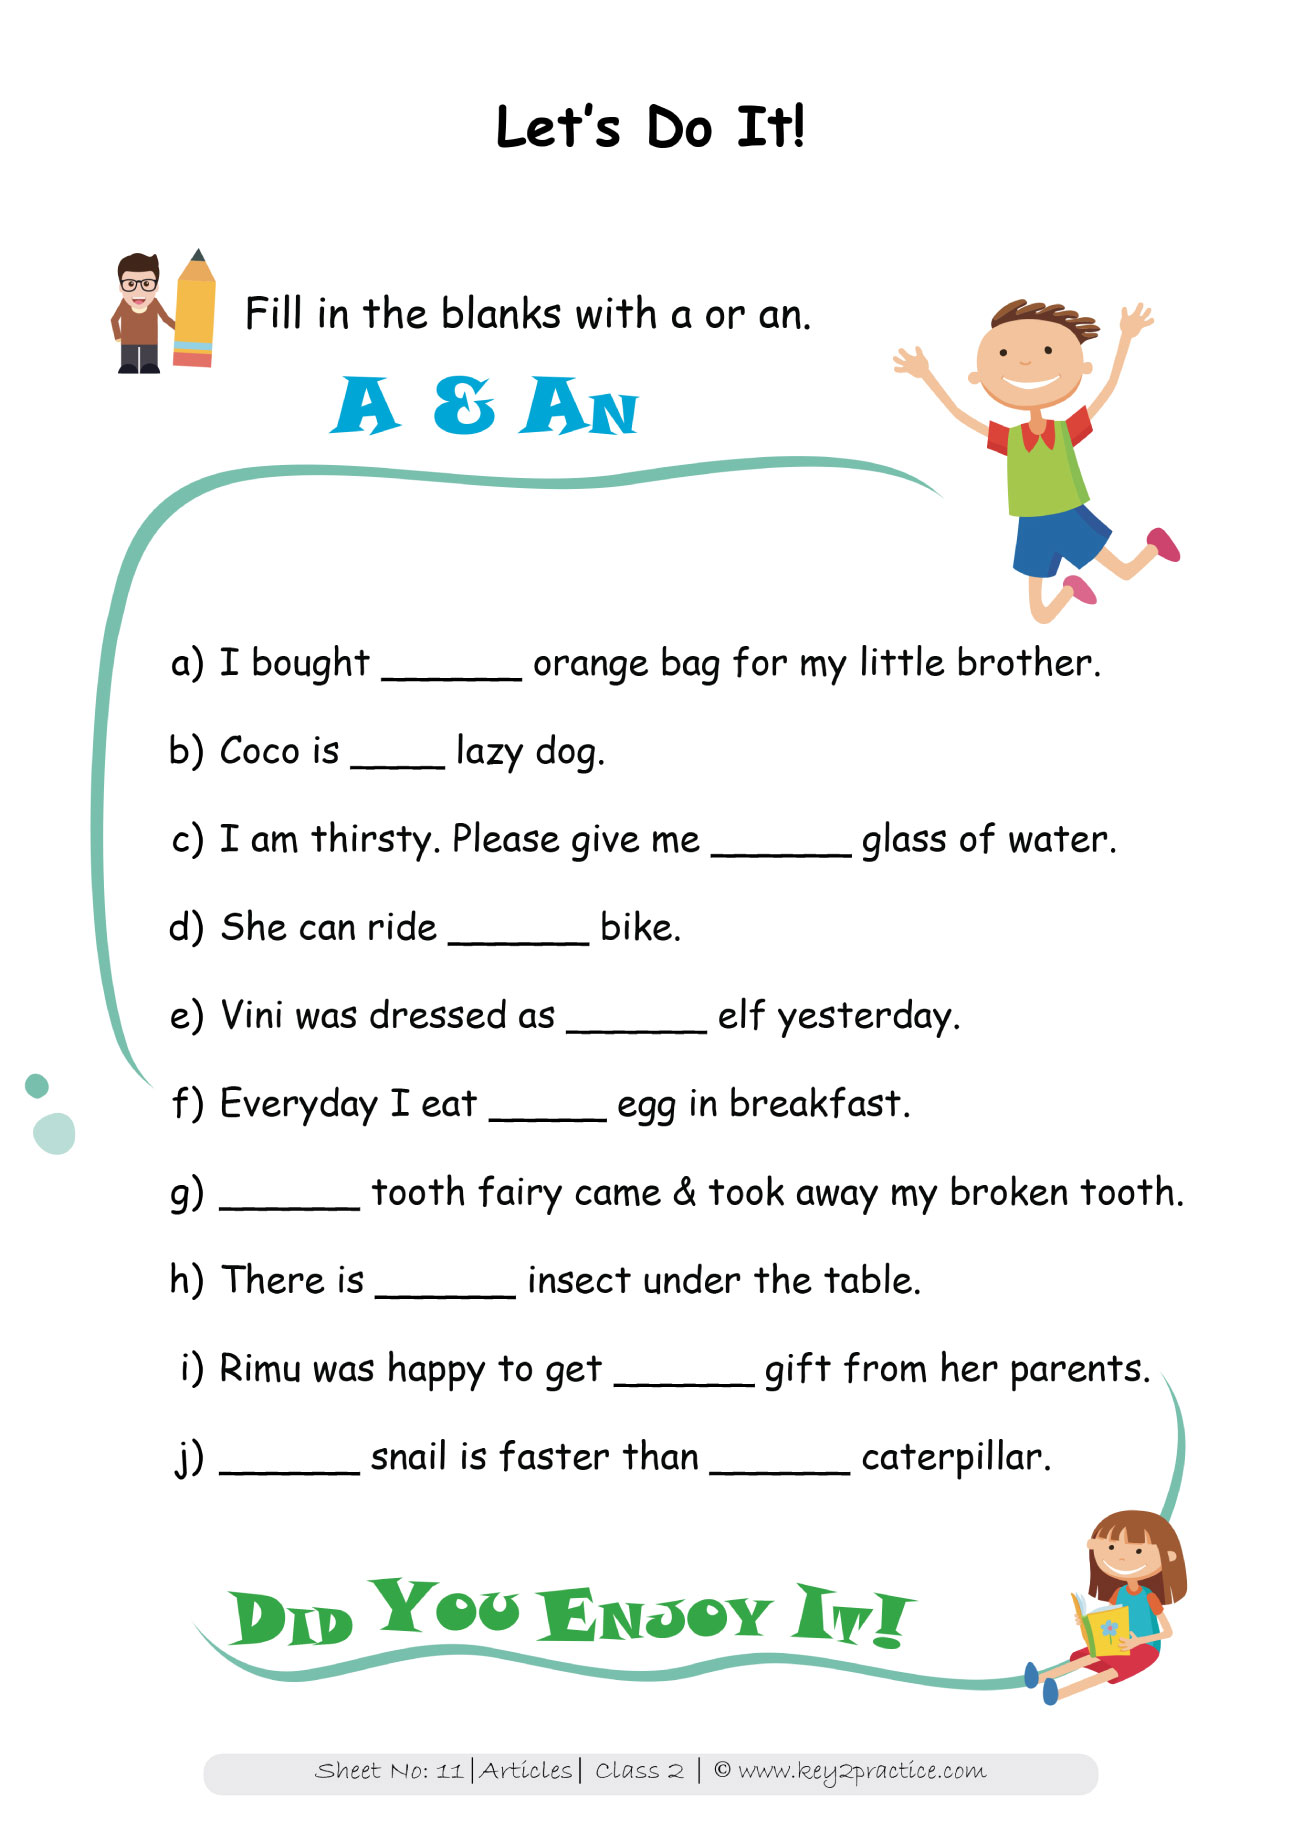 English Grammar Worksheets I Grade 2 Articles Key2practice Workbooks